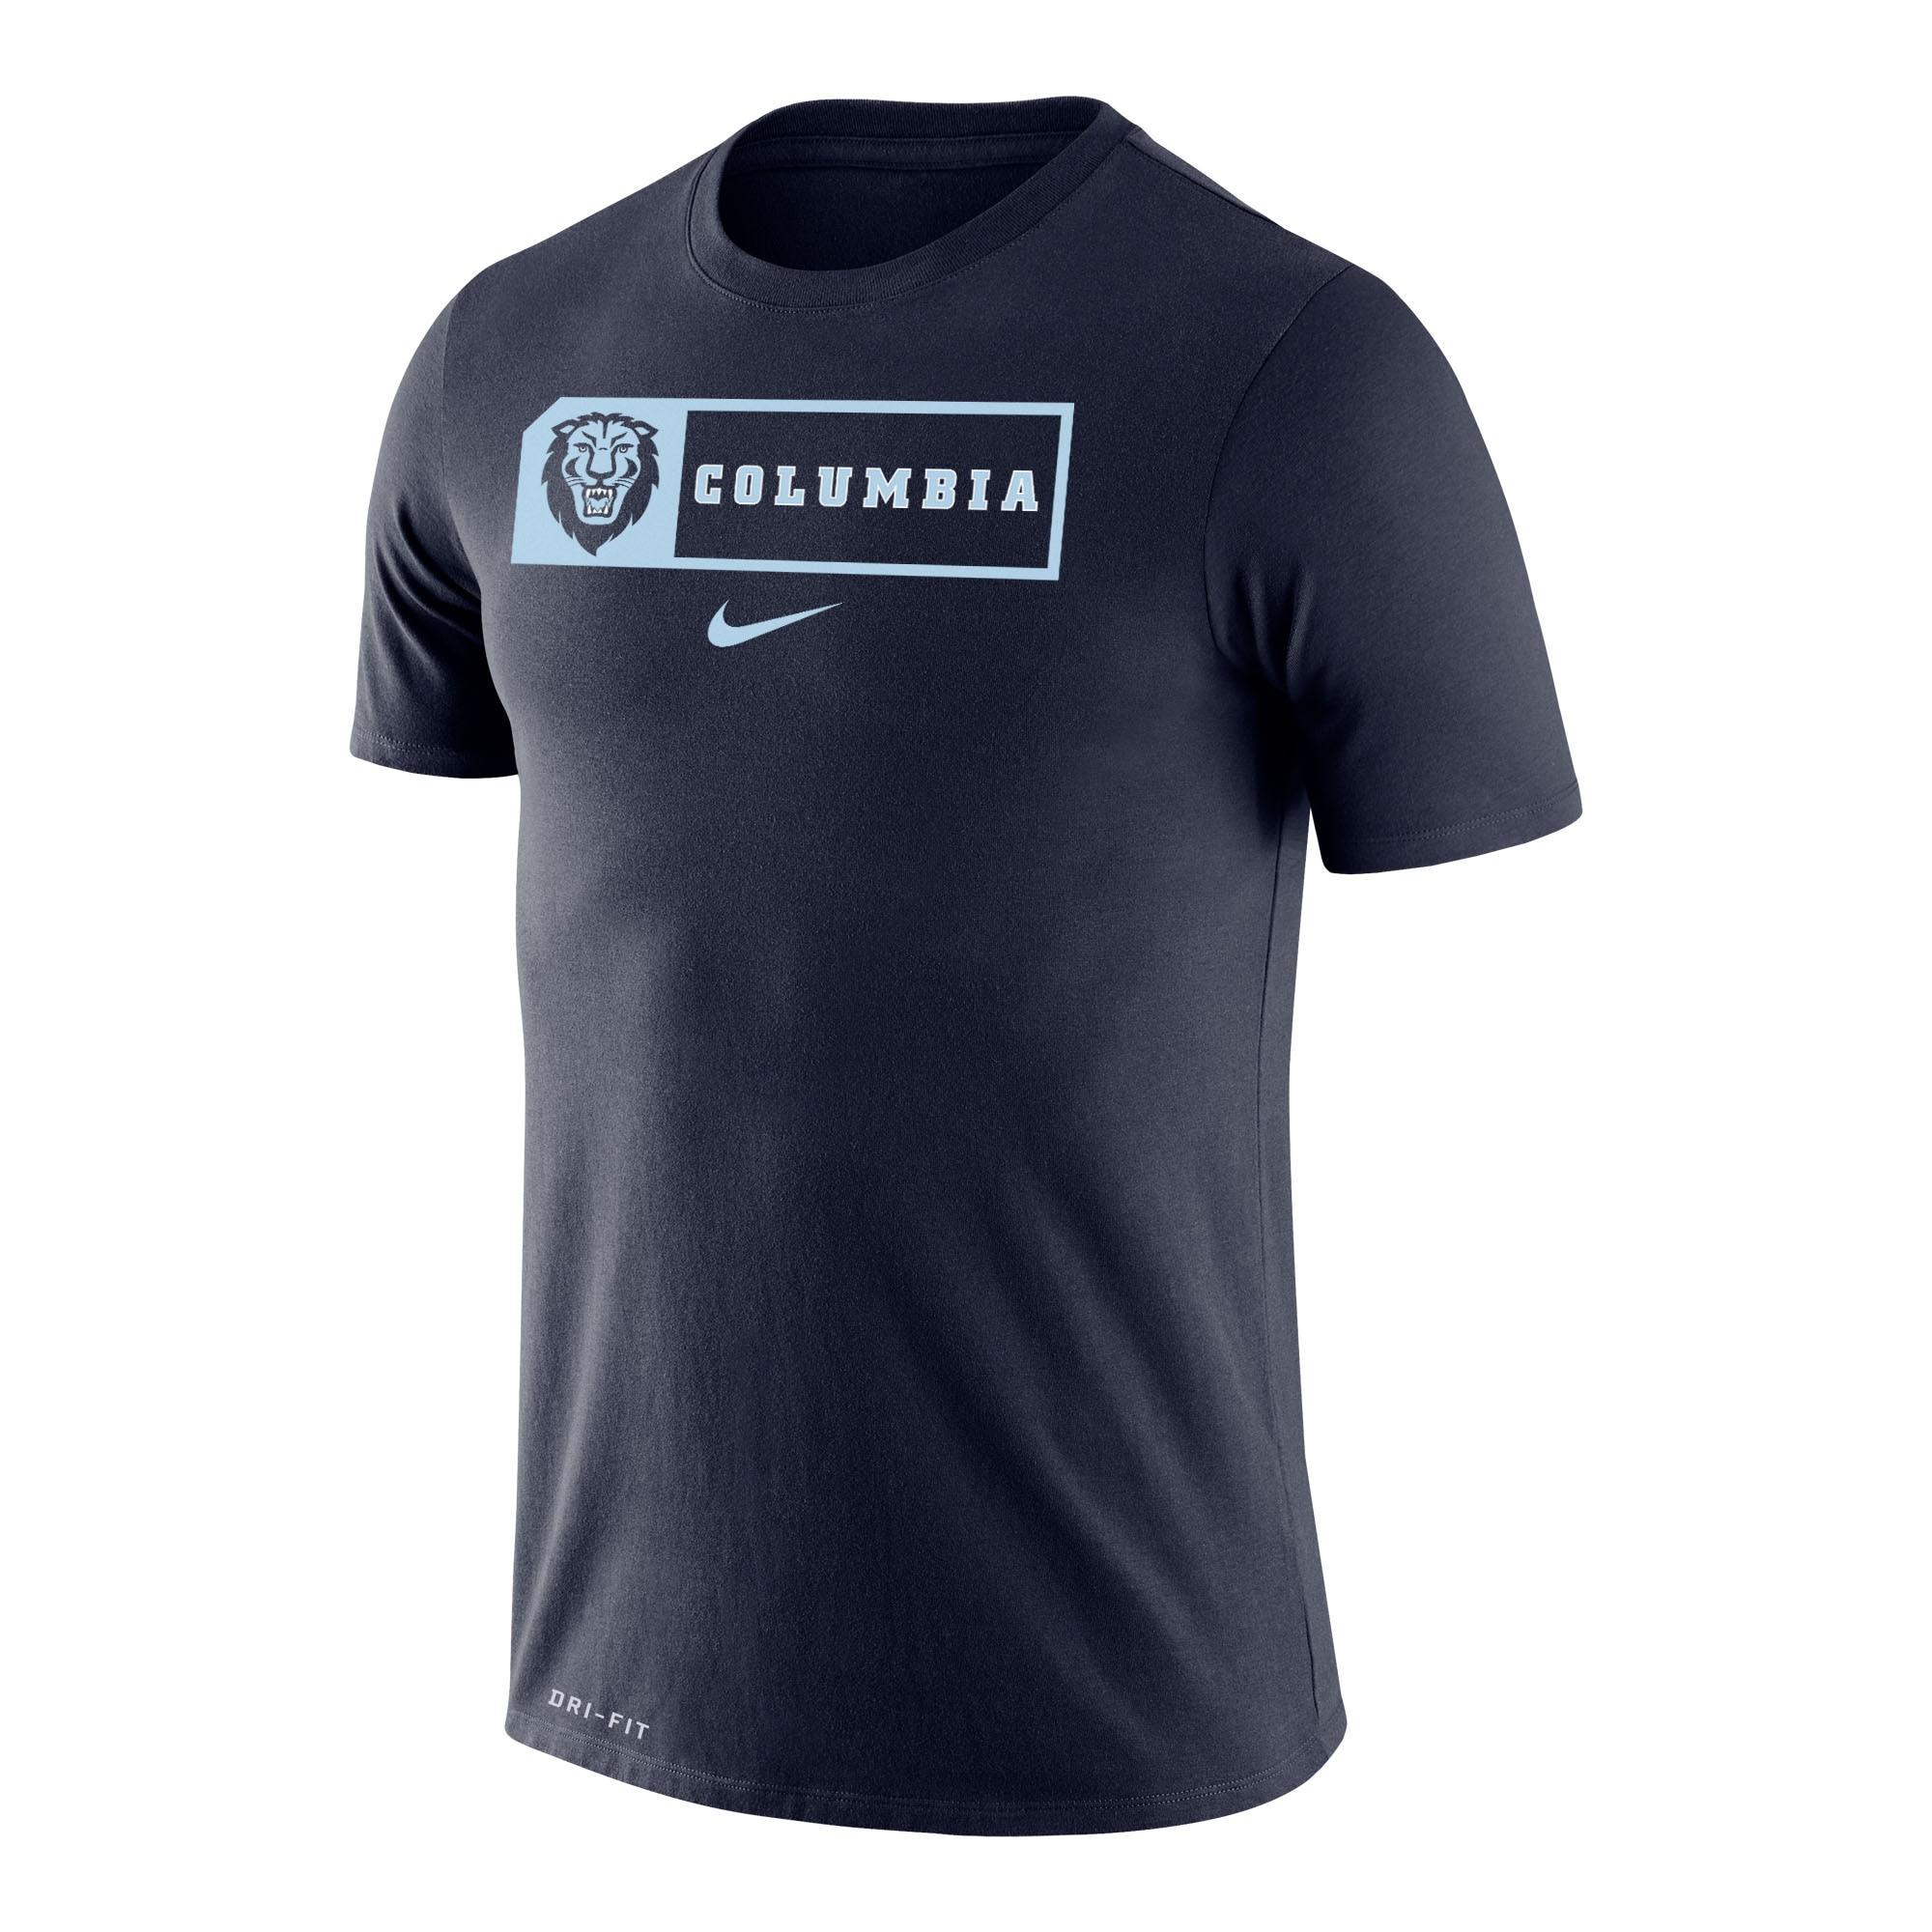 Columbia University Nike DRI-FIT Legend Short Sleeve T-Shirt